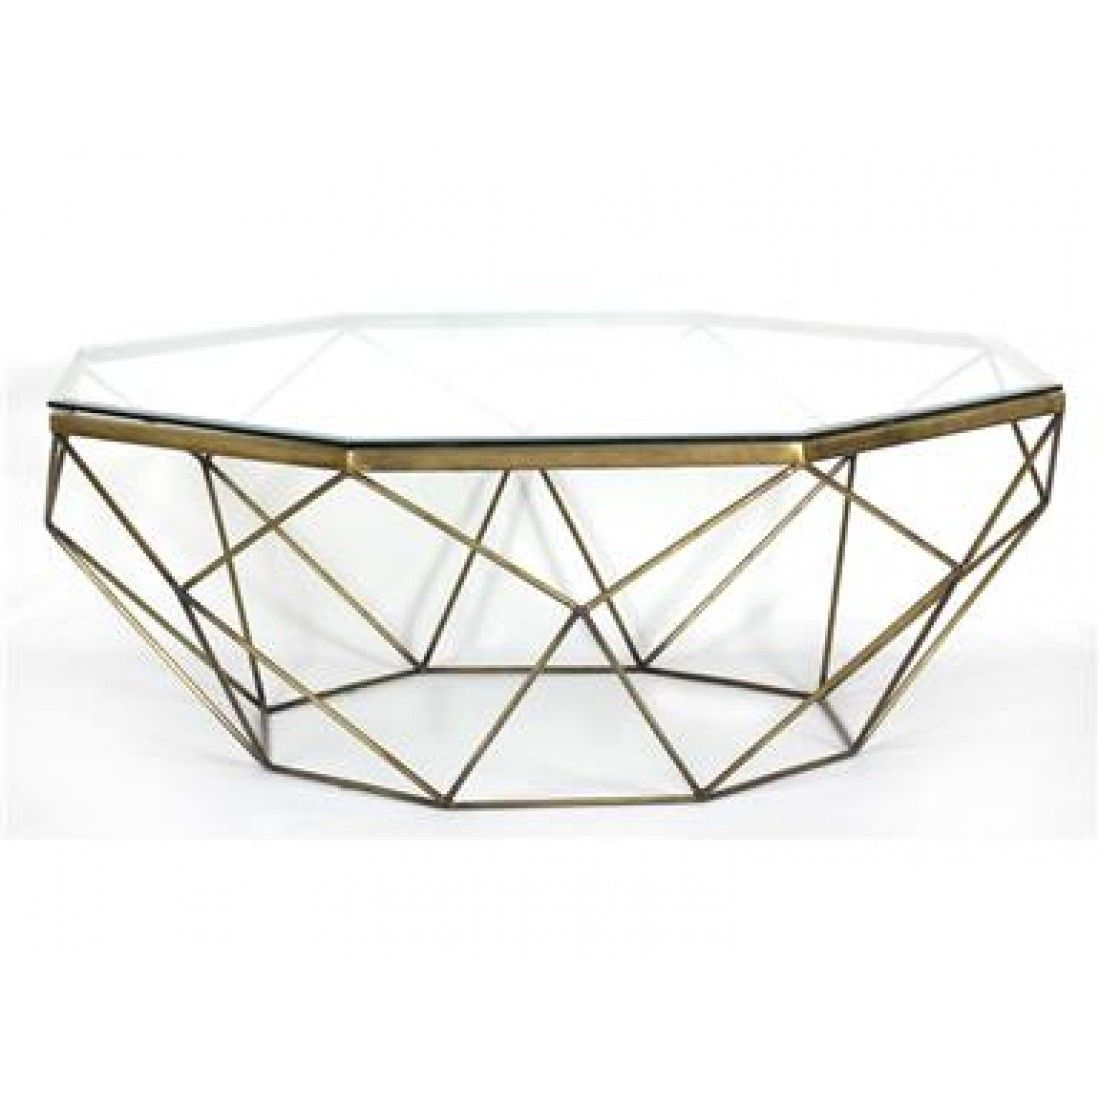 Marlow Geometric Coffee Table Antique Brass Geometric Coffee